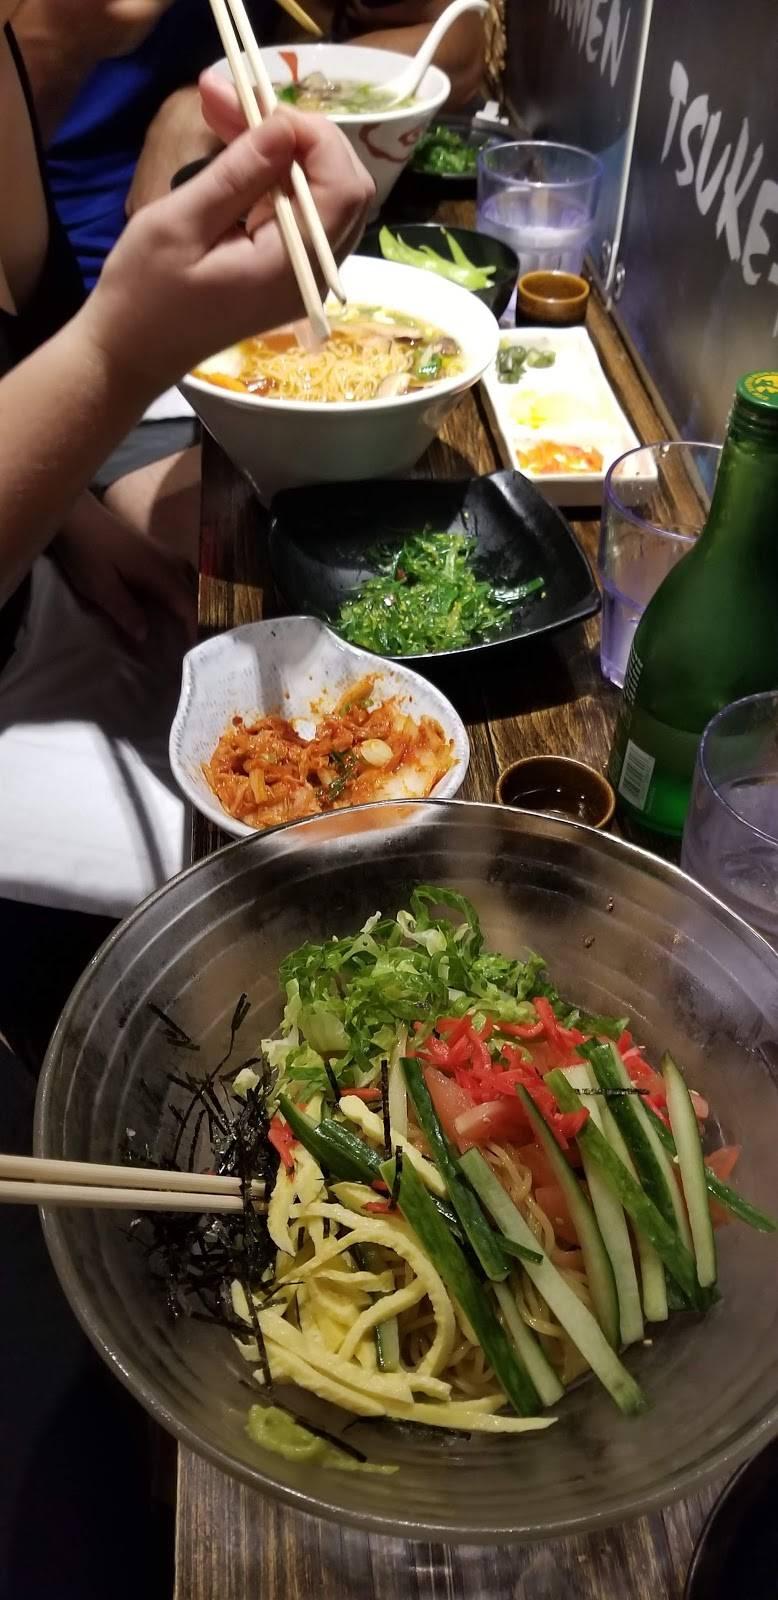 Tamashii | restaurant | 47-36 Vernon Blvd, Long Island City, NY 11101, USA | 7184722142 OR +1 718-472-2142